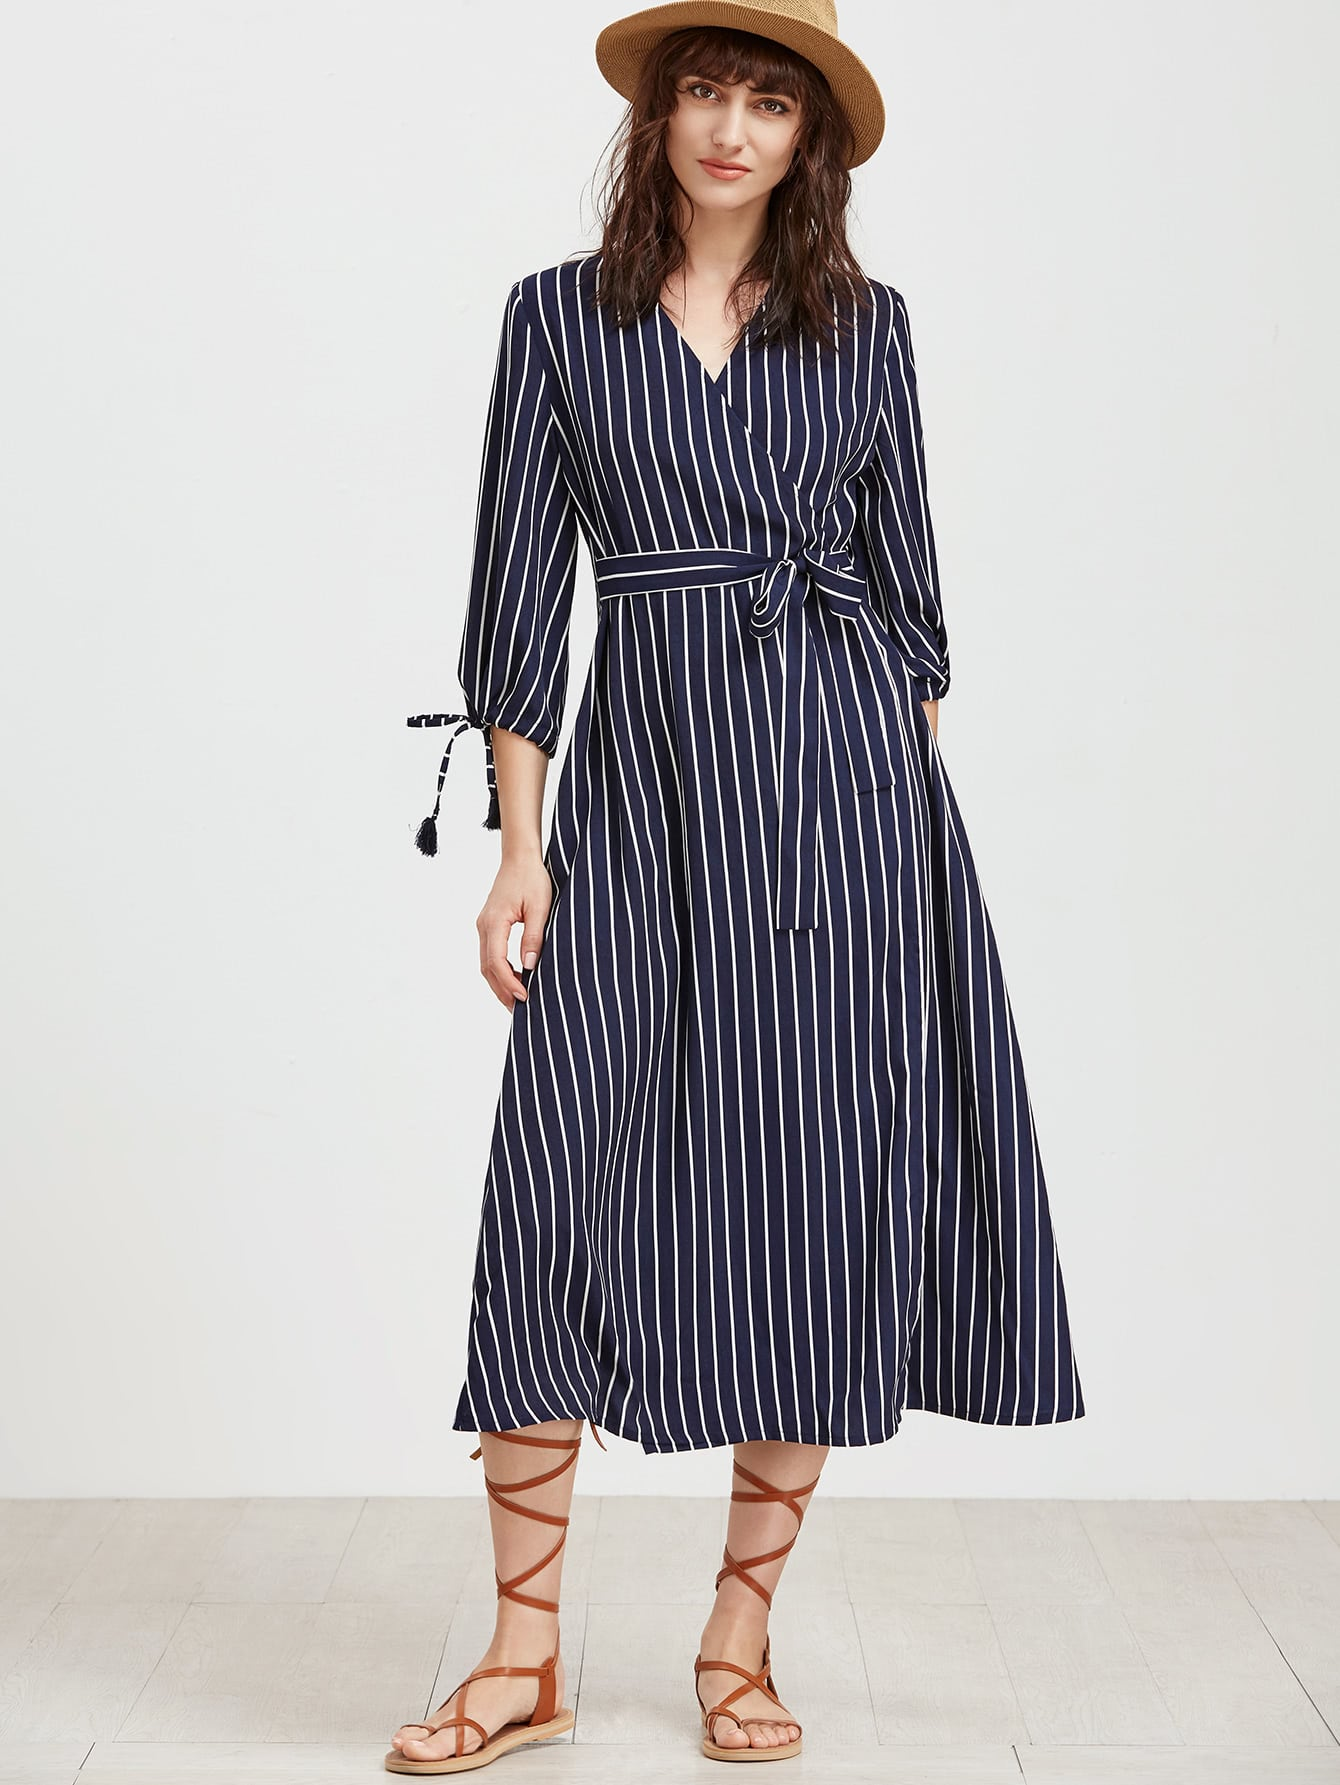 Vertical Striped Tie Cuff Surplice Wrap Dress dress170214706